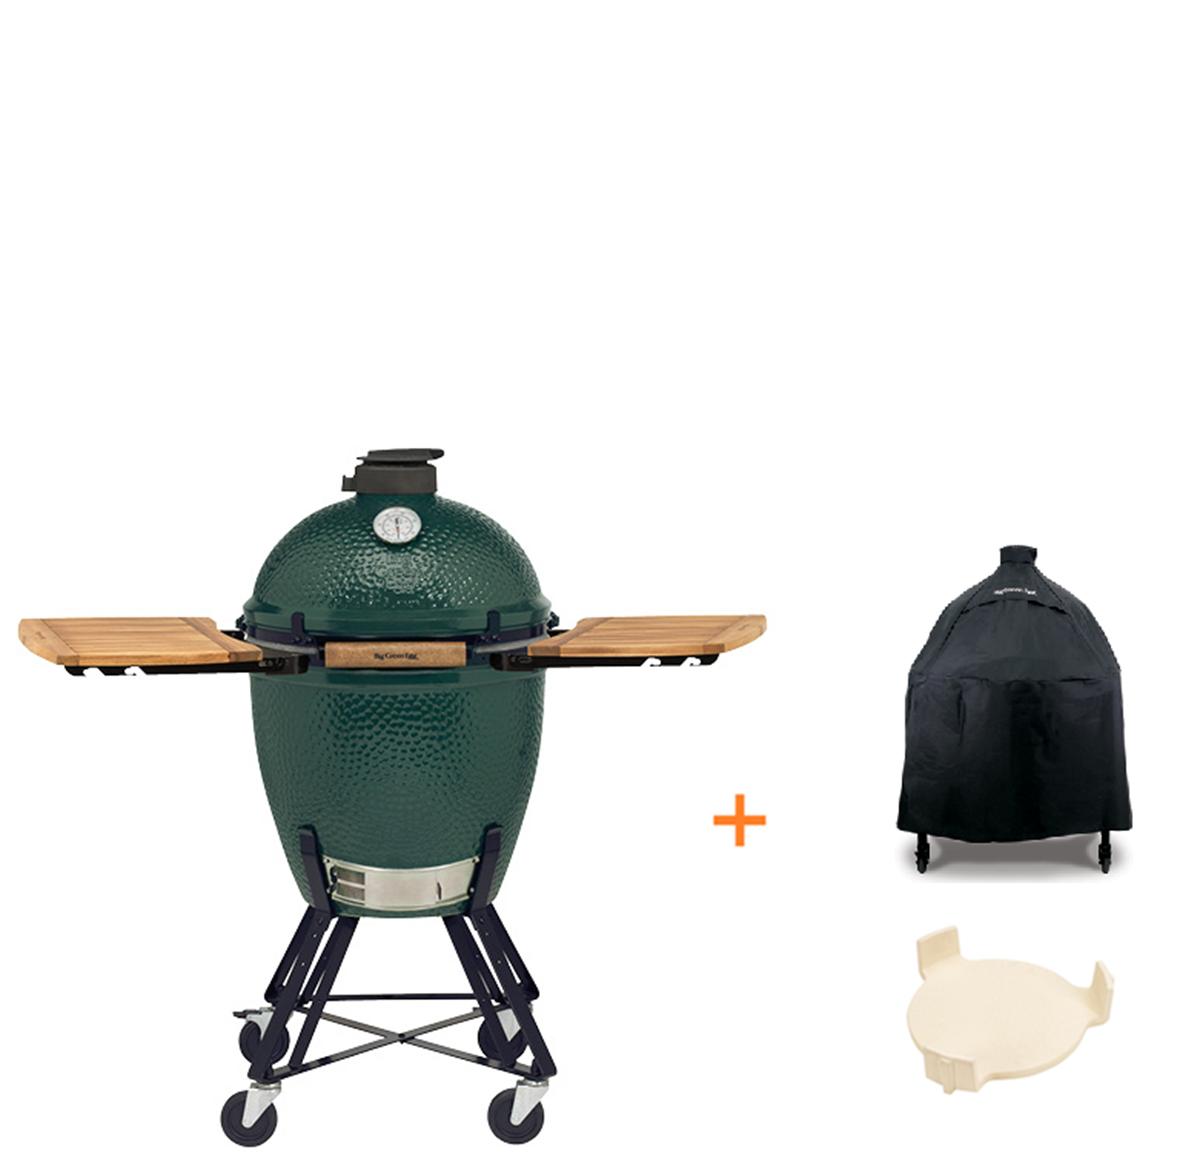 Big Green Egg Large + Onderstel + Zijtafels + Hoes Dé BBQ